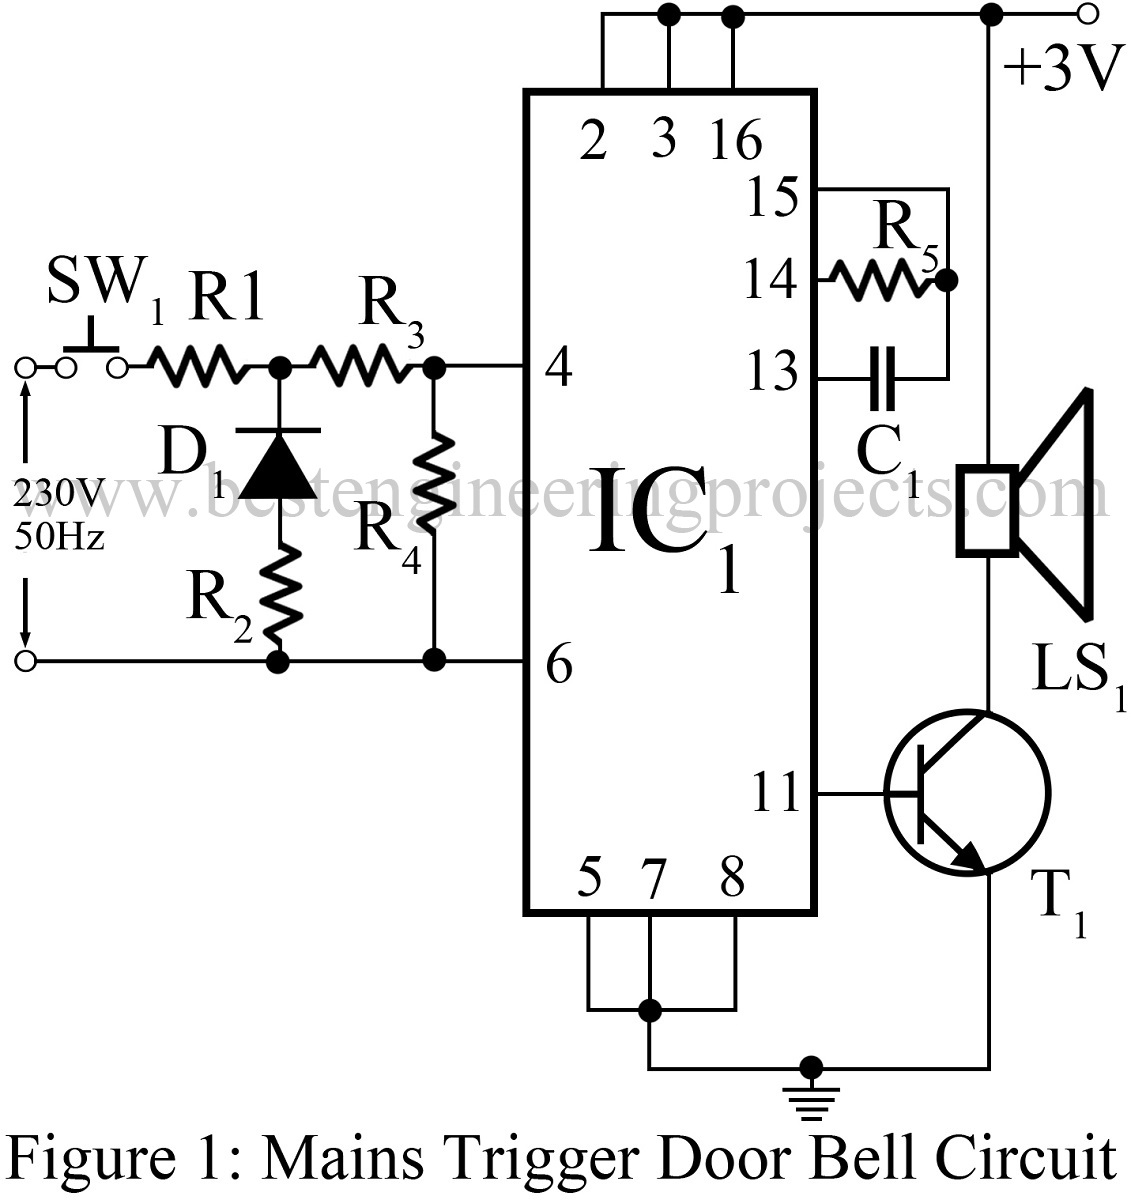 hight resolution of mains trigger musical door bell circuit engineering projects simple door bell circuit diagram door bell circuit diagram